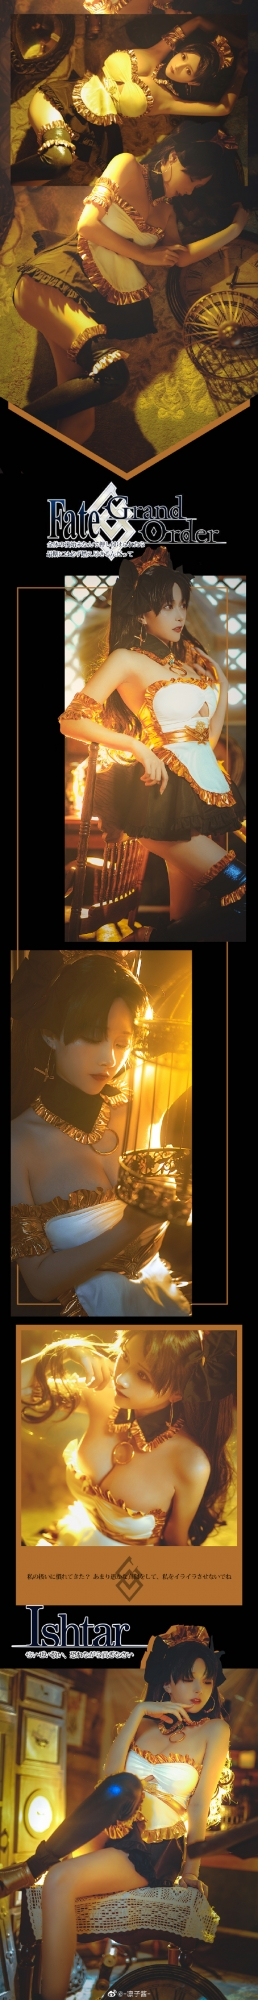 Fate/GrandOrder   伊什塔尔   @-凛子酱- (9P)-第8张